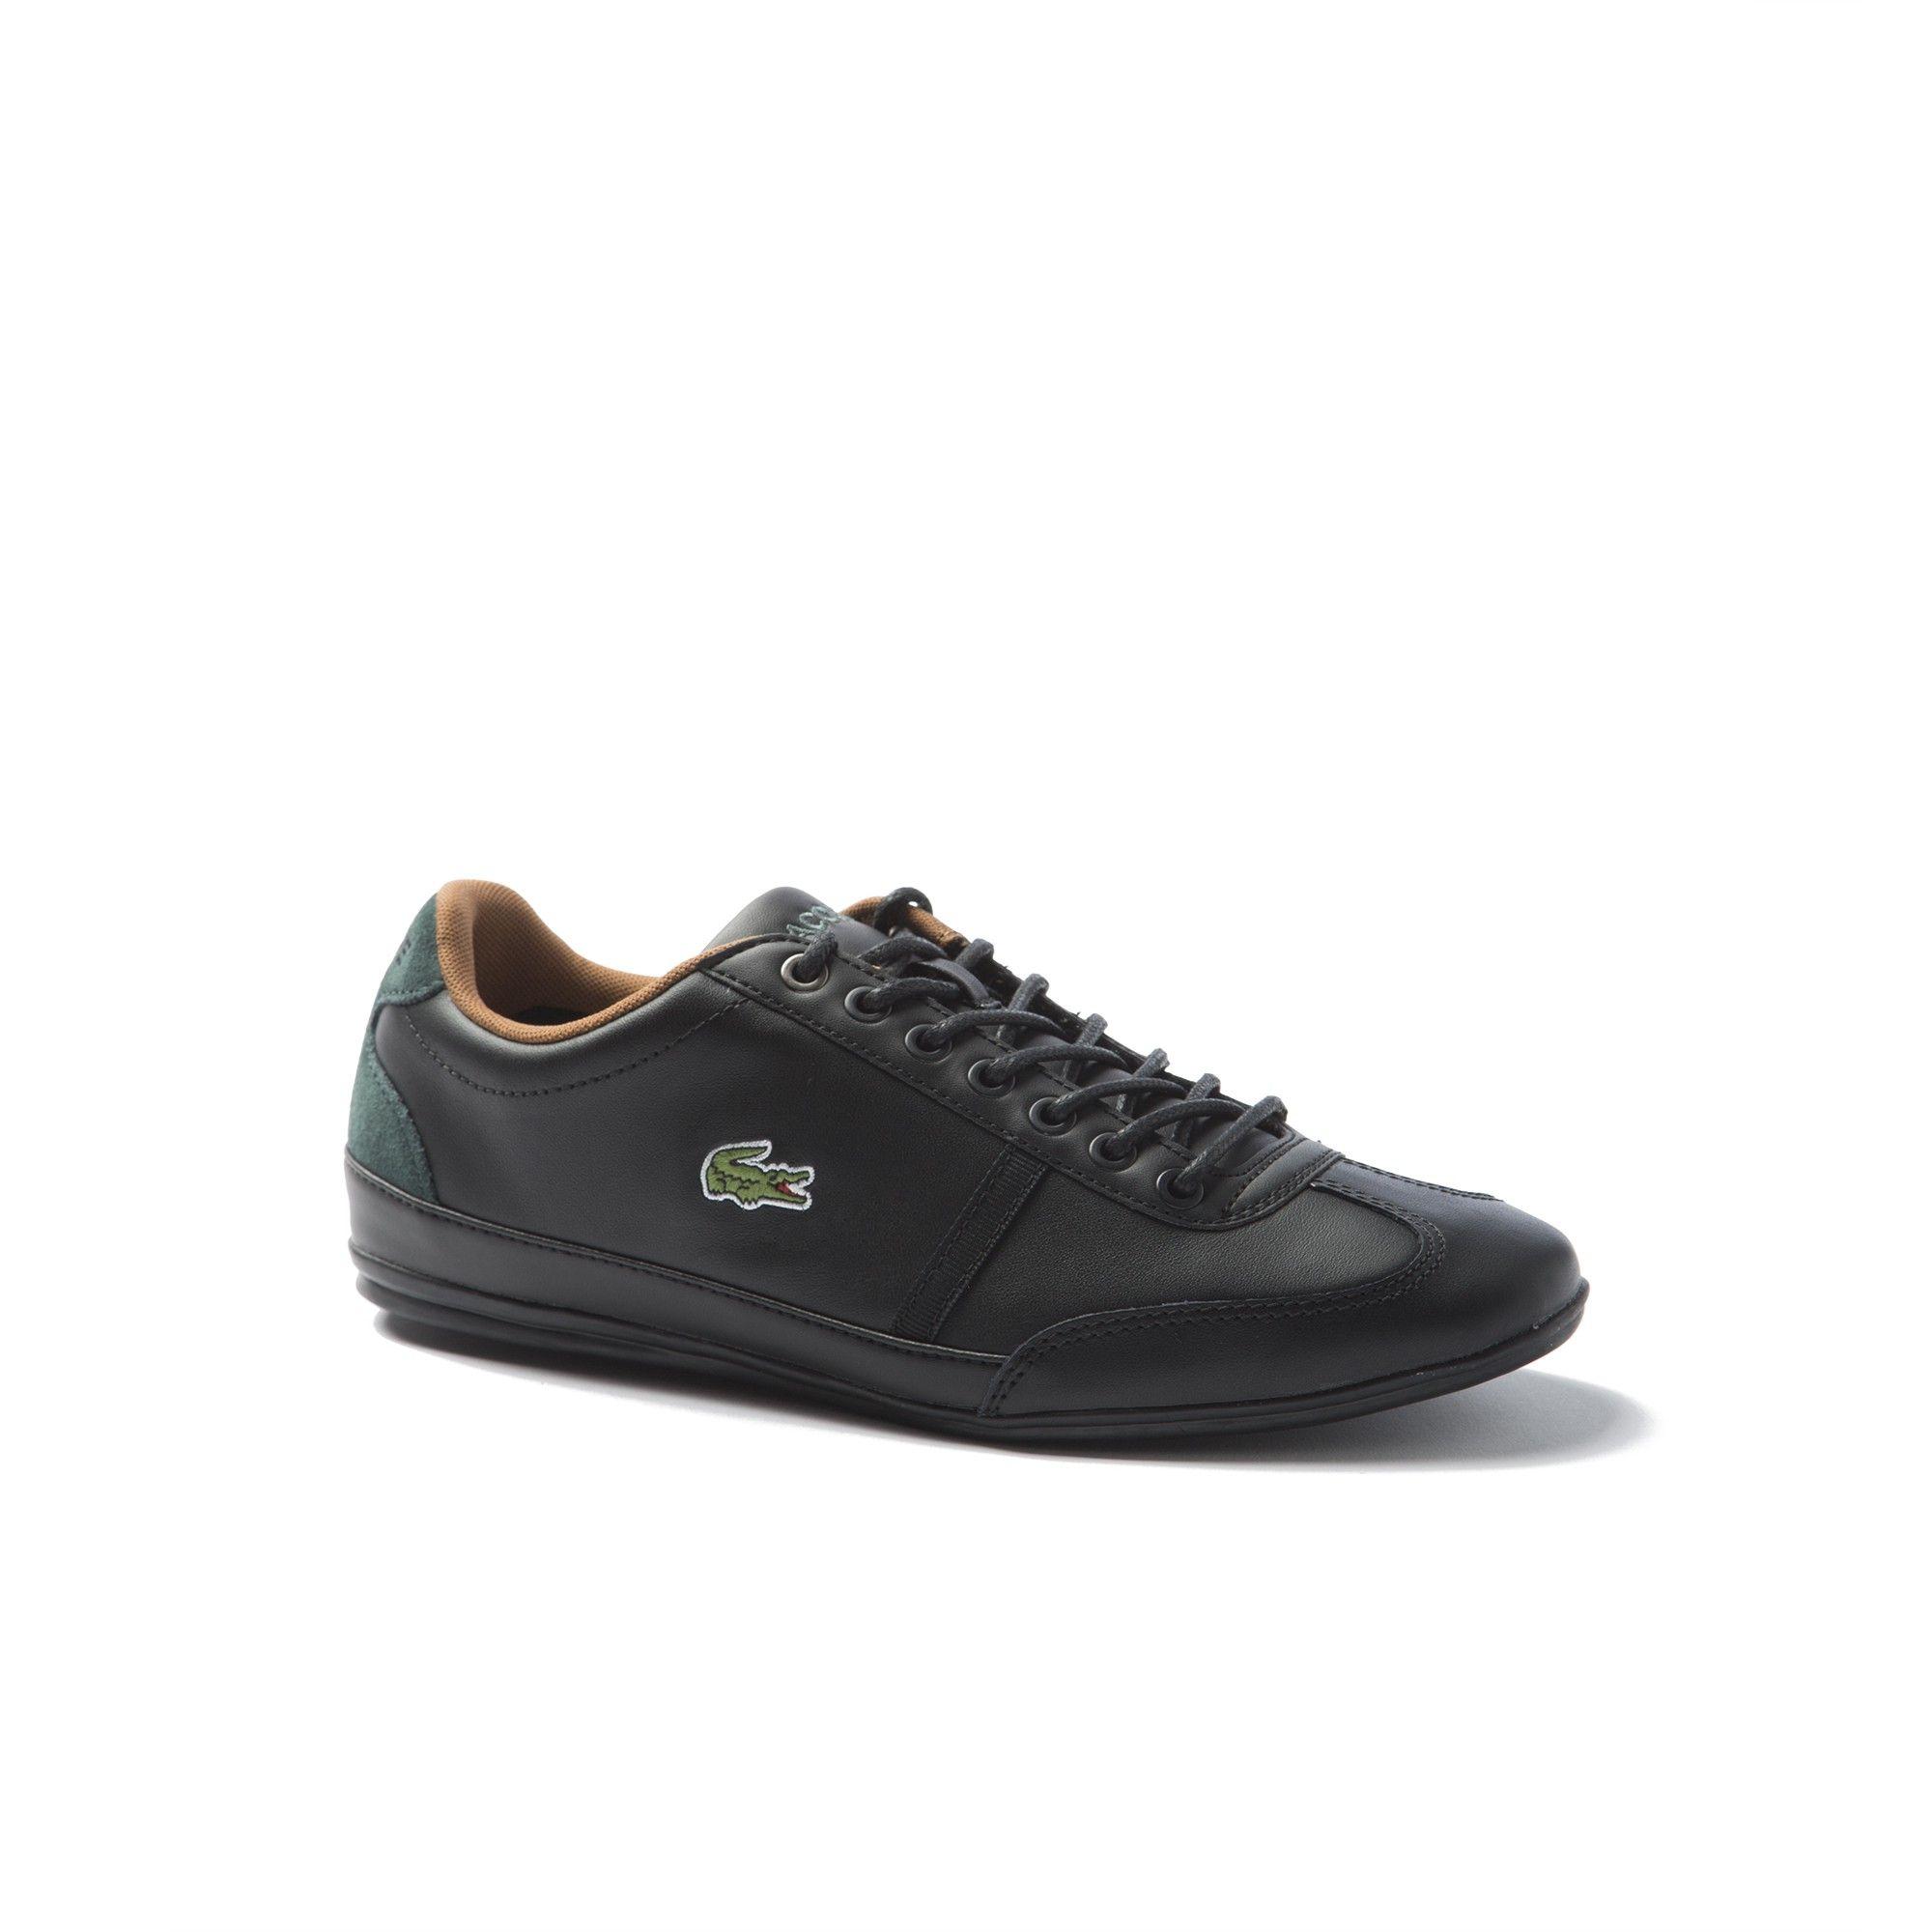 eab061172e83cc Lacoste Men s Misano Sport Leather Sneakers - Black Black 9.5 Green